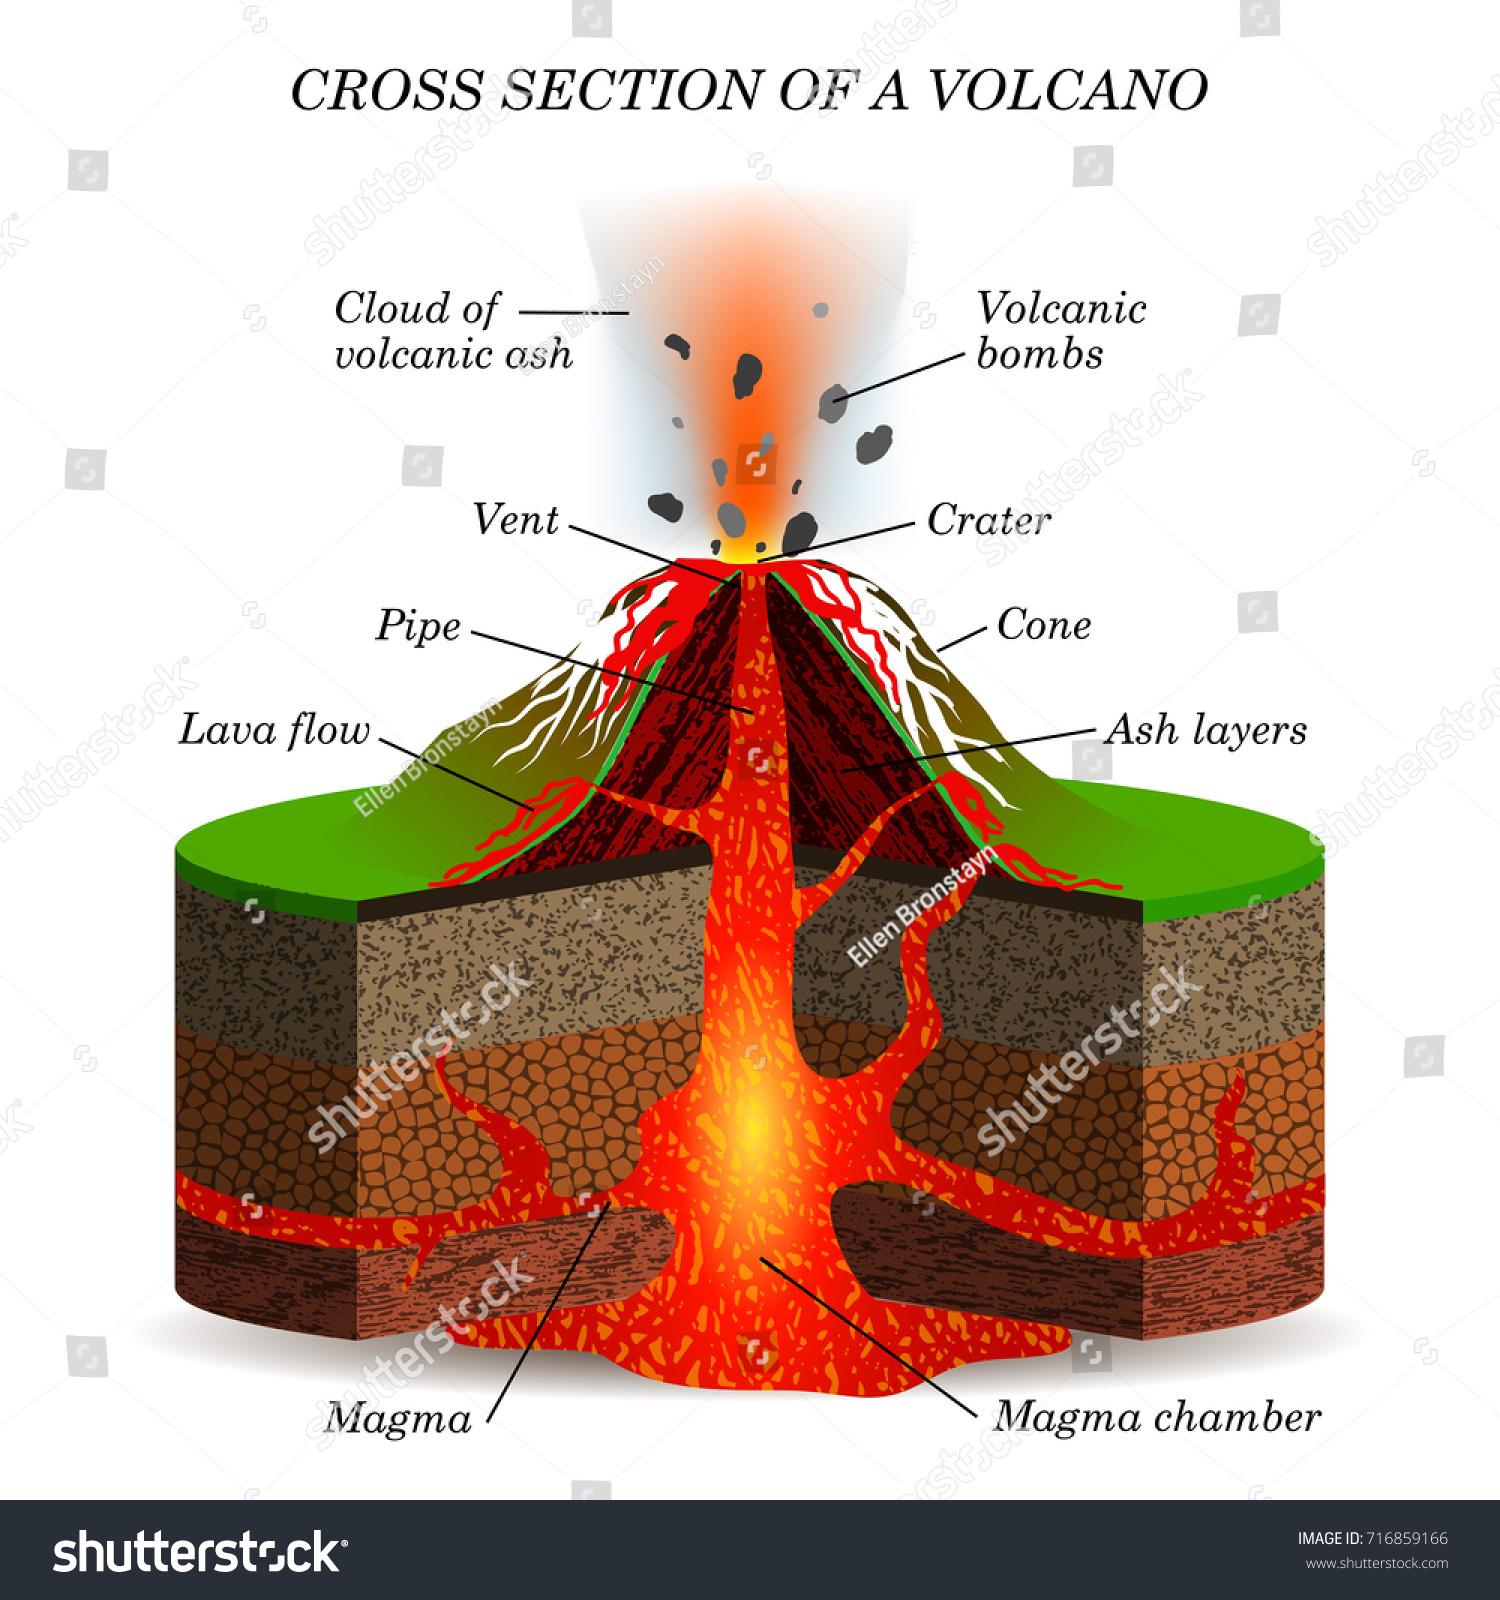 Volcano Igneous Eruption Cross Section Education Stock ...